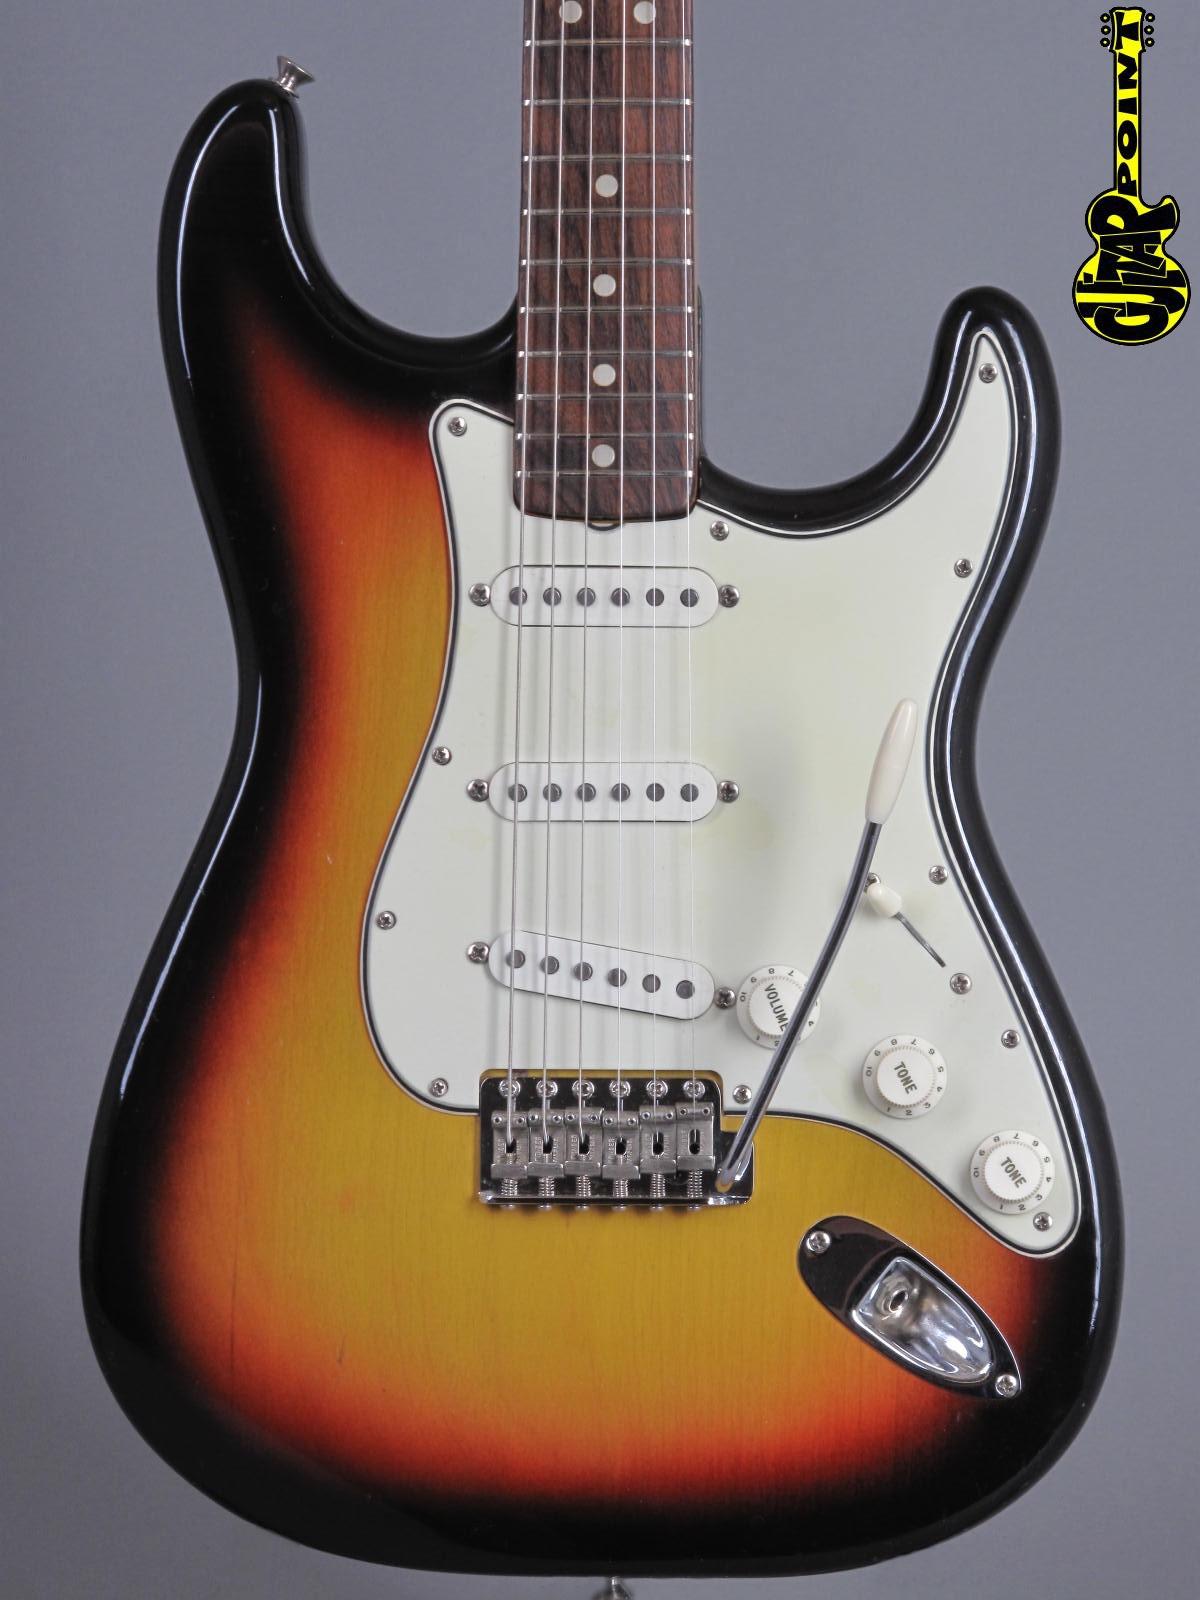 1965 Fender Stratocaster - 3t-Sunburst  ...green guard + Mint !!!